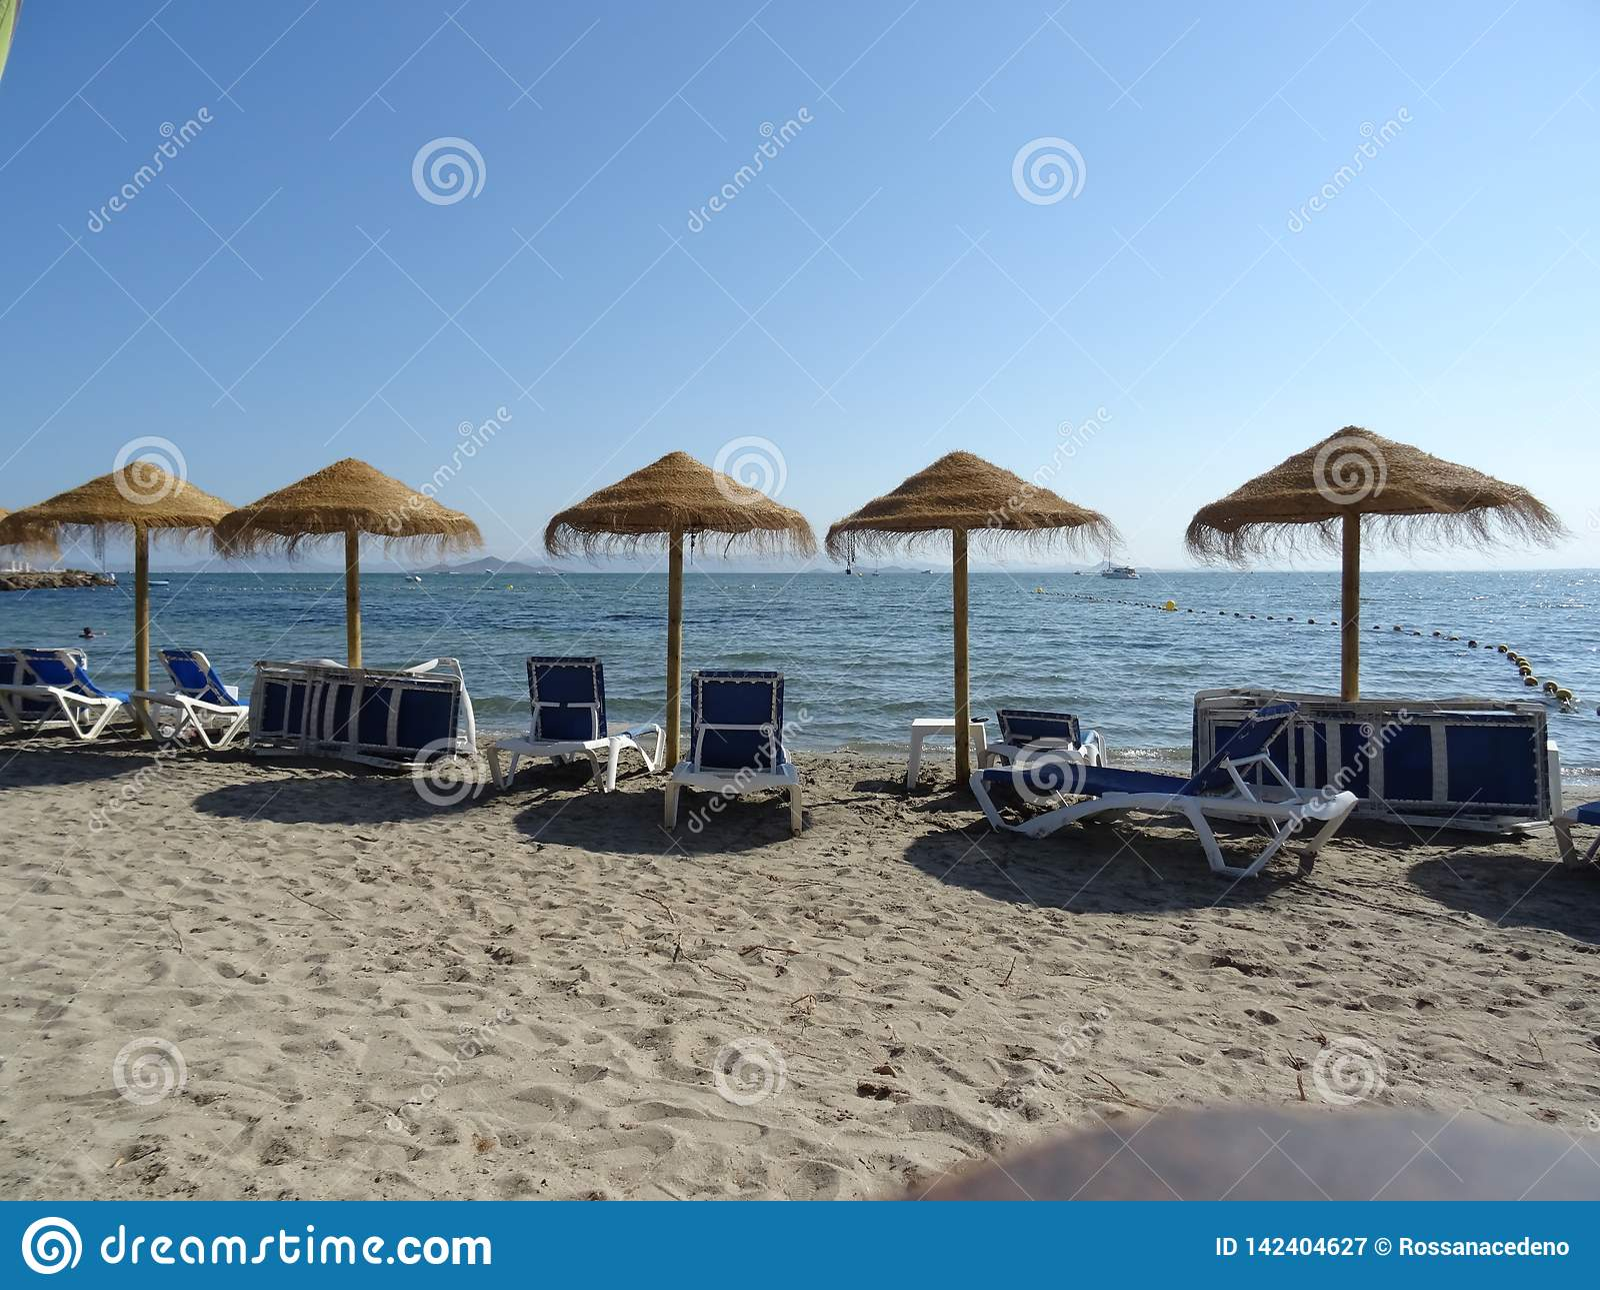 Sandy beach, chairs and umbrellas in La Manga, Spain